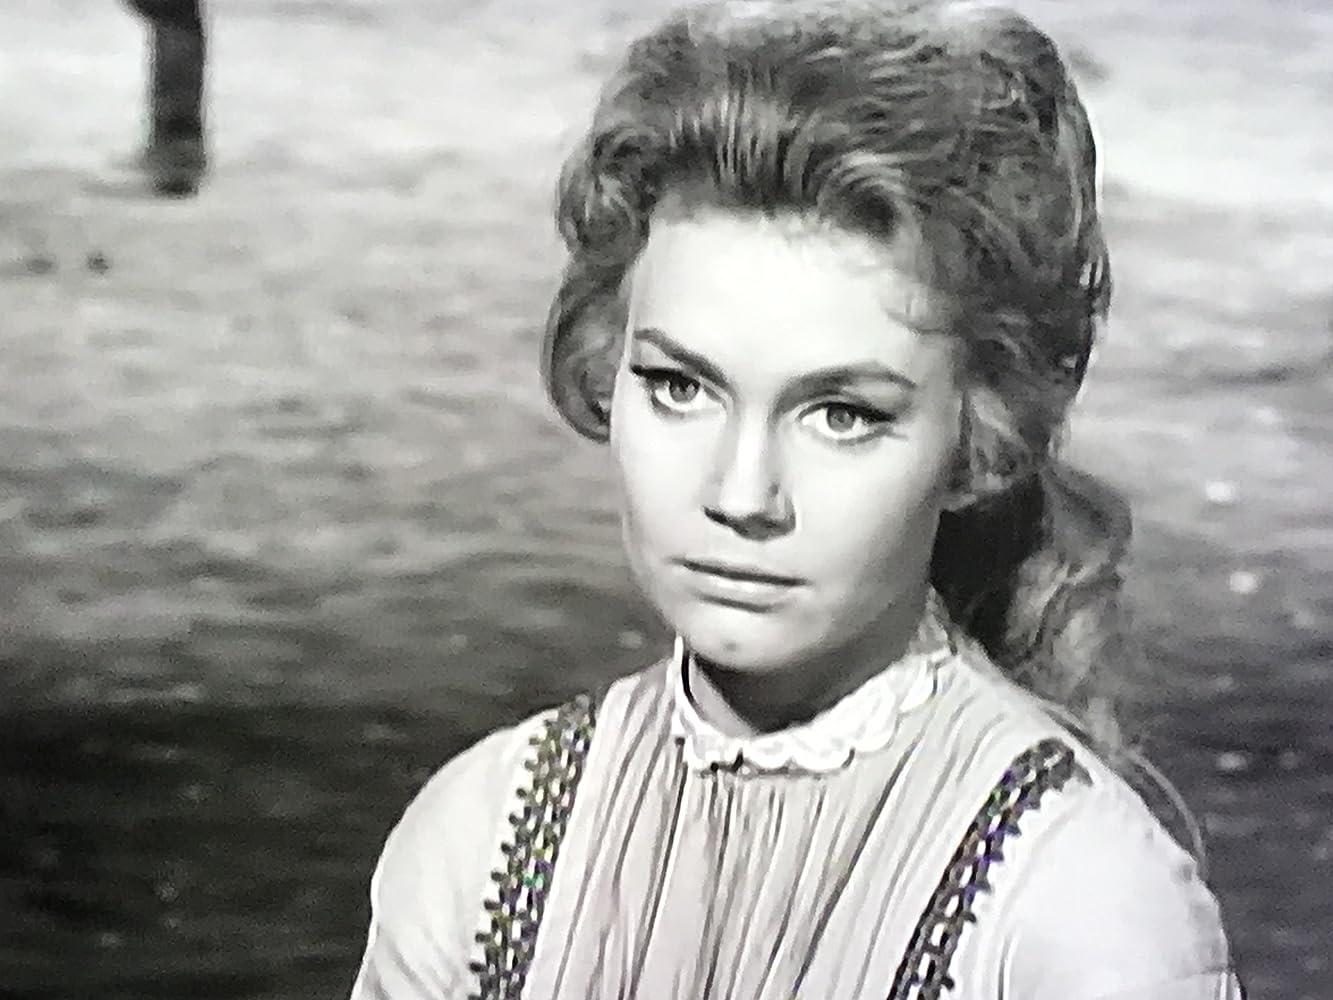 David Jason (born 1940),Summer Phoenix Hot pics & movies Stefania Careddu,Caryn Richman